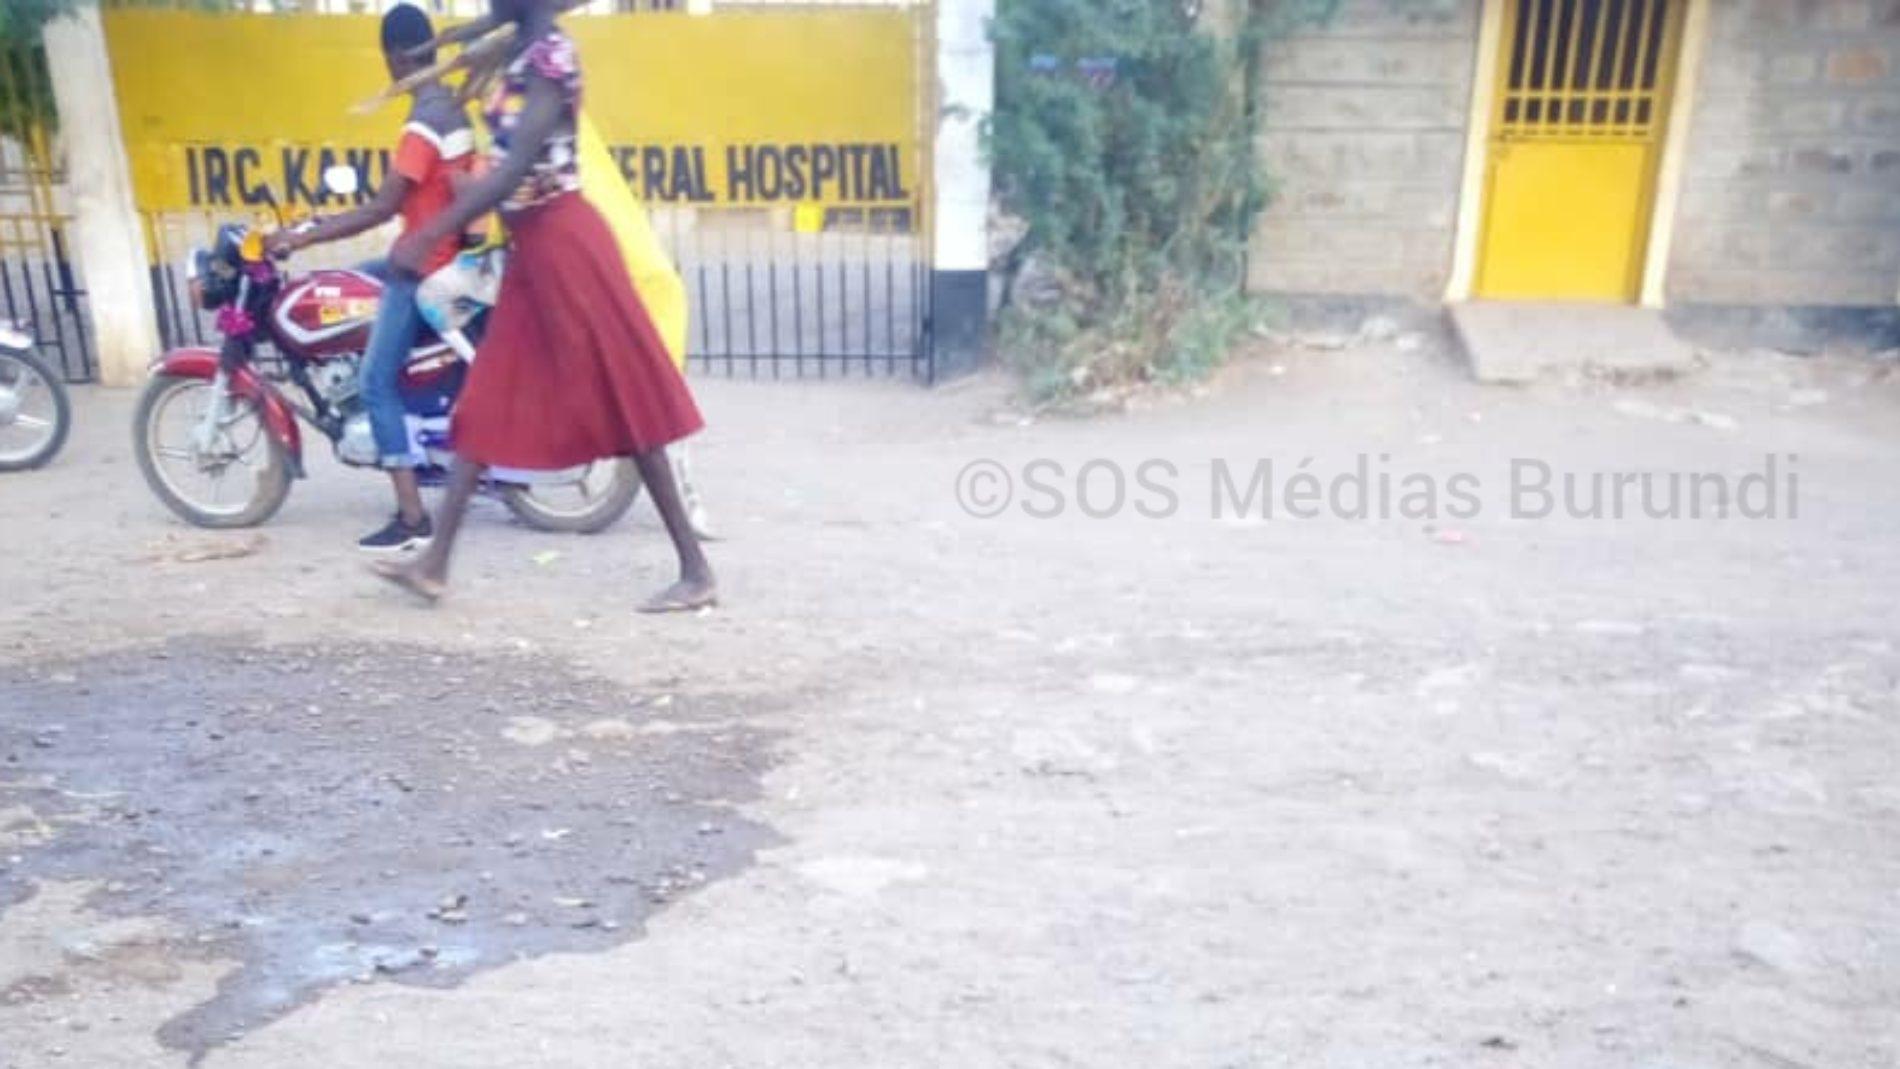 Dzaleka (Malawi) et Kakuma (Kenya) : les réfugiés burundais déplorent des conditions de vie intenables